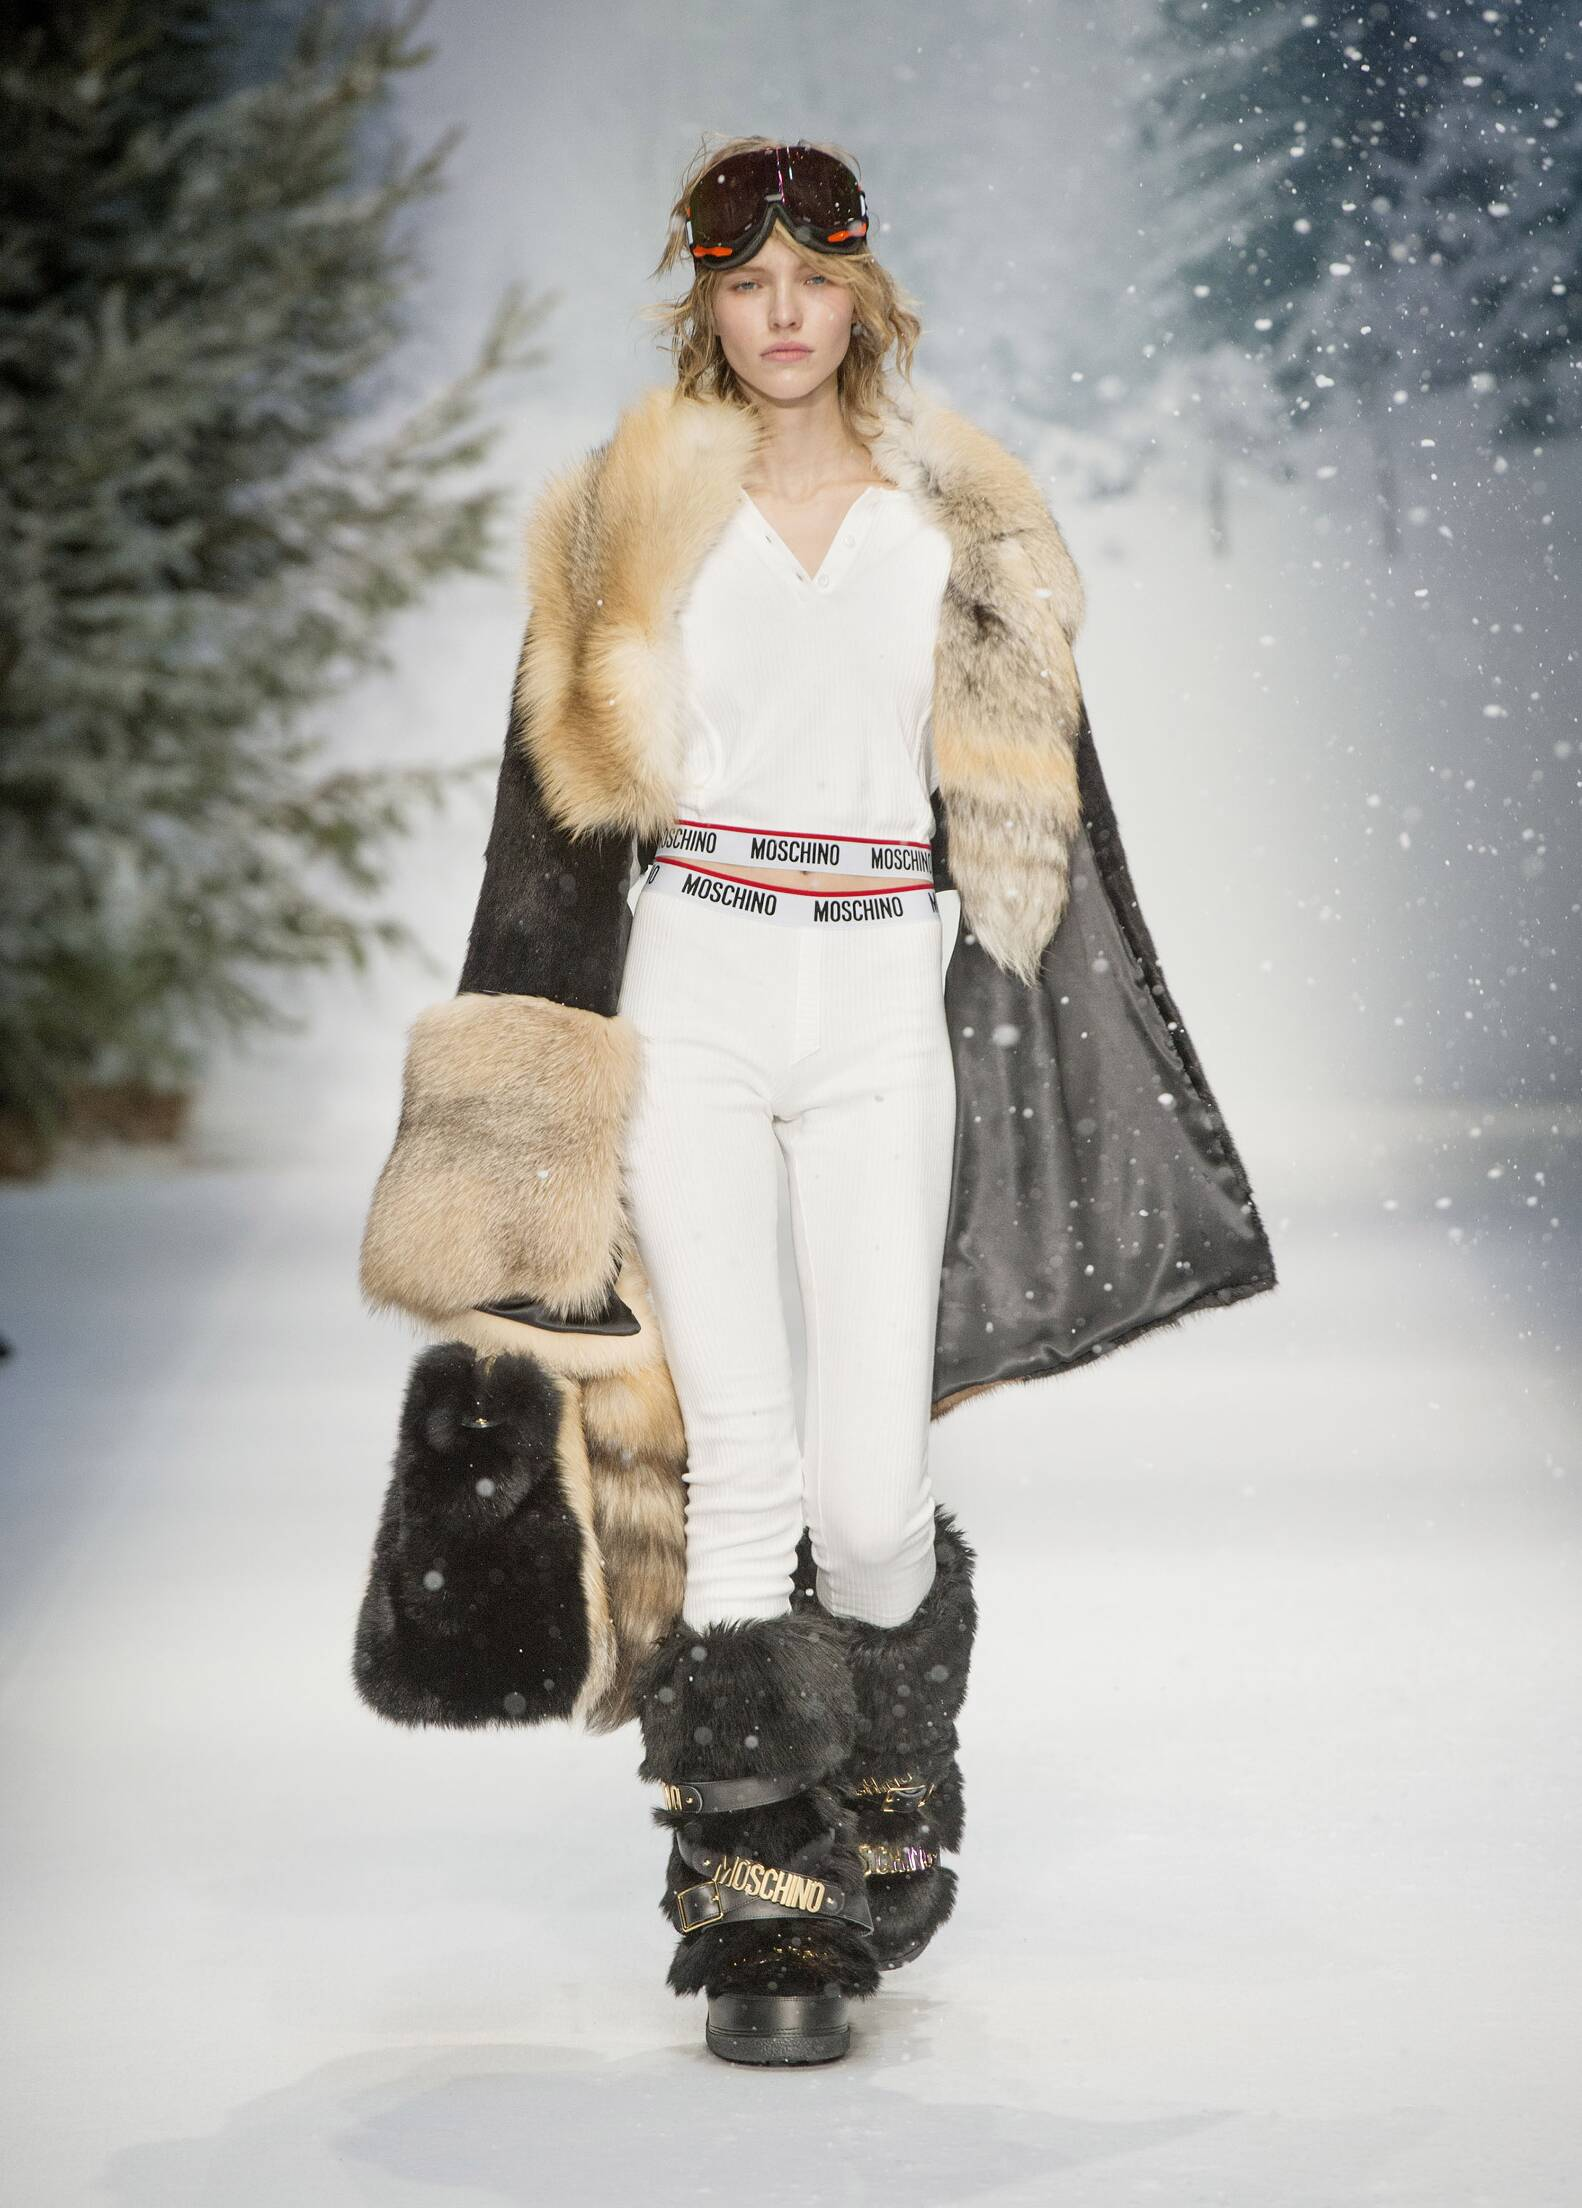 Moschino Woman Style 2016